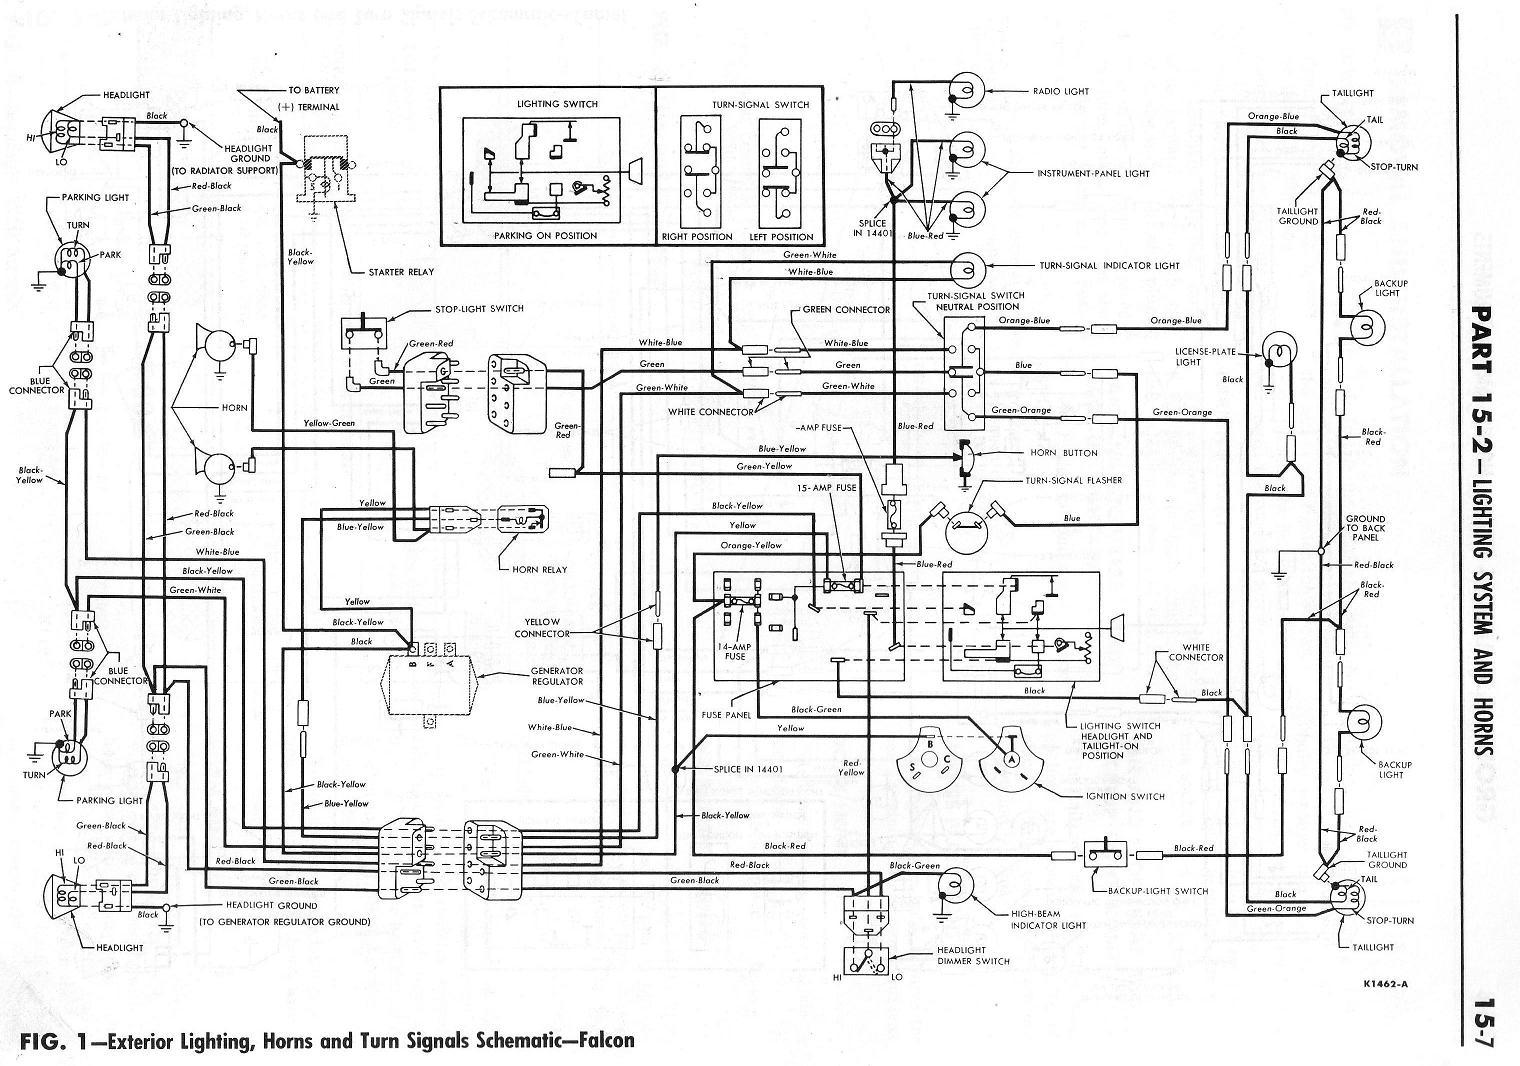 Swell 1964 Falcon Wiring Diagram Wiring Diagram Database Wiring Cloud Ymoonsalvmohammedshrineorg